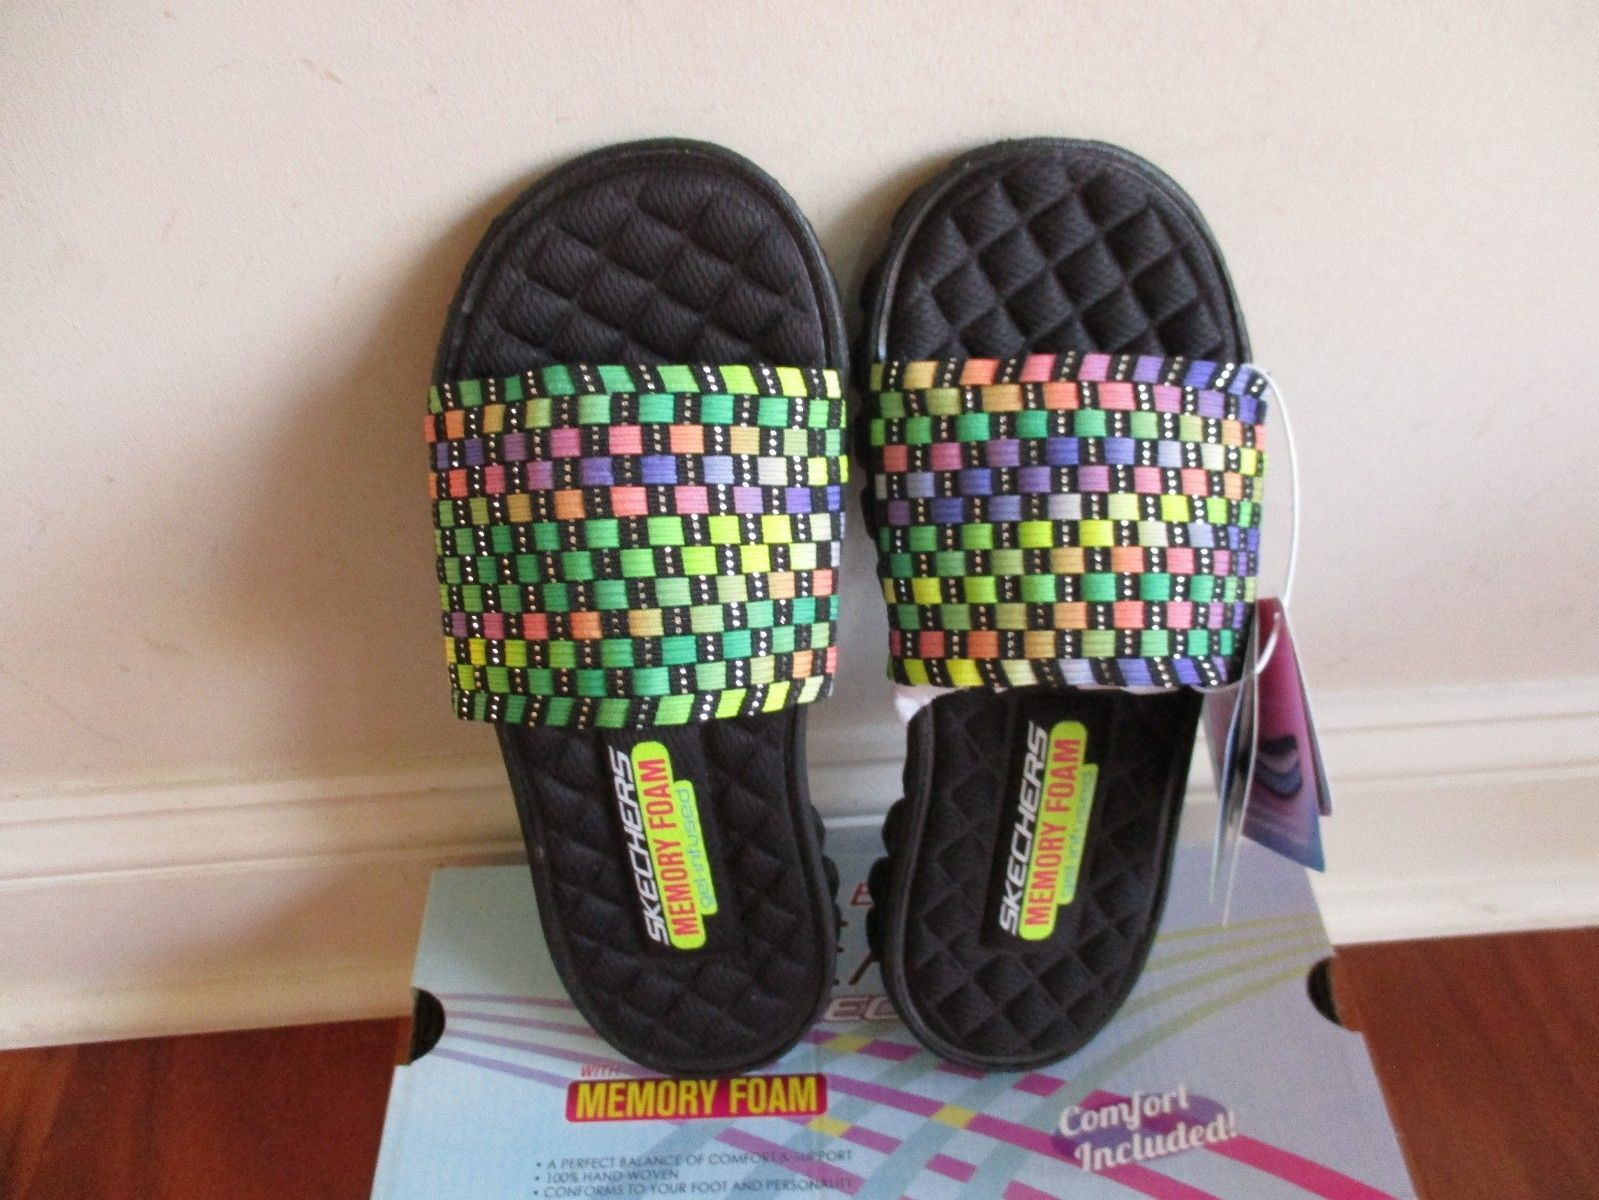 BNIB Skechers Ez flex Cool Sand Piper or and 50 similar items